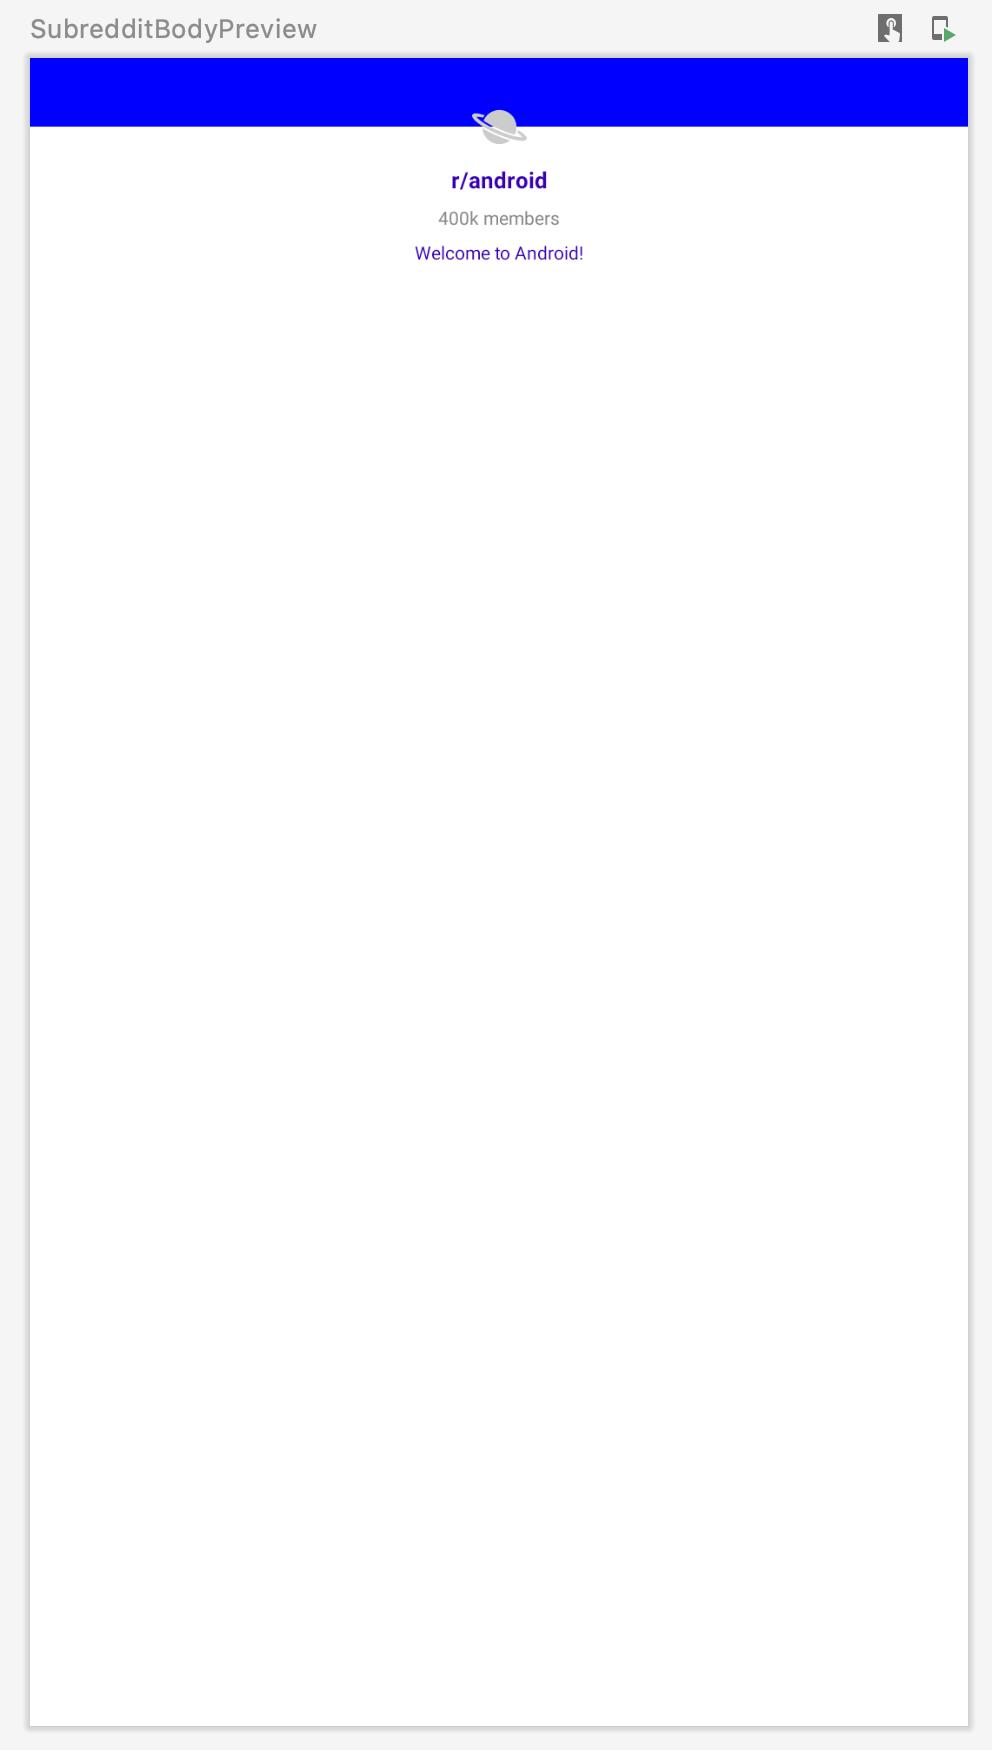 Subreddit Body Preview